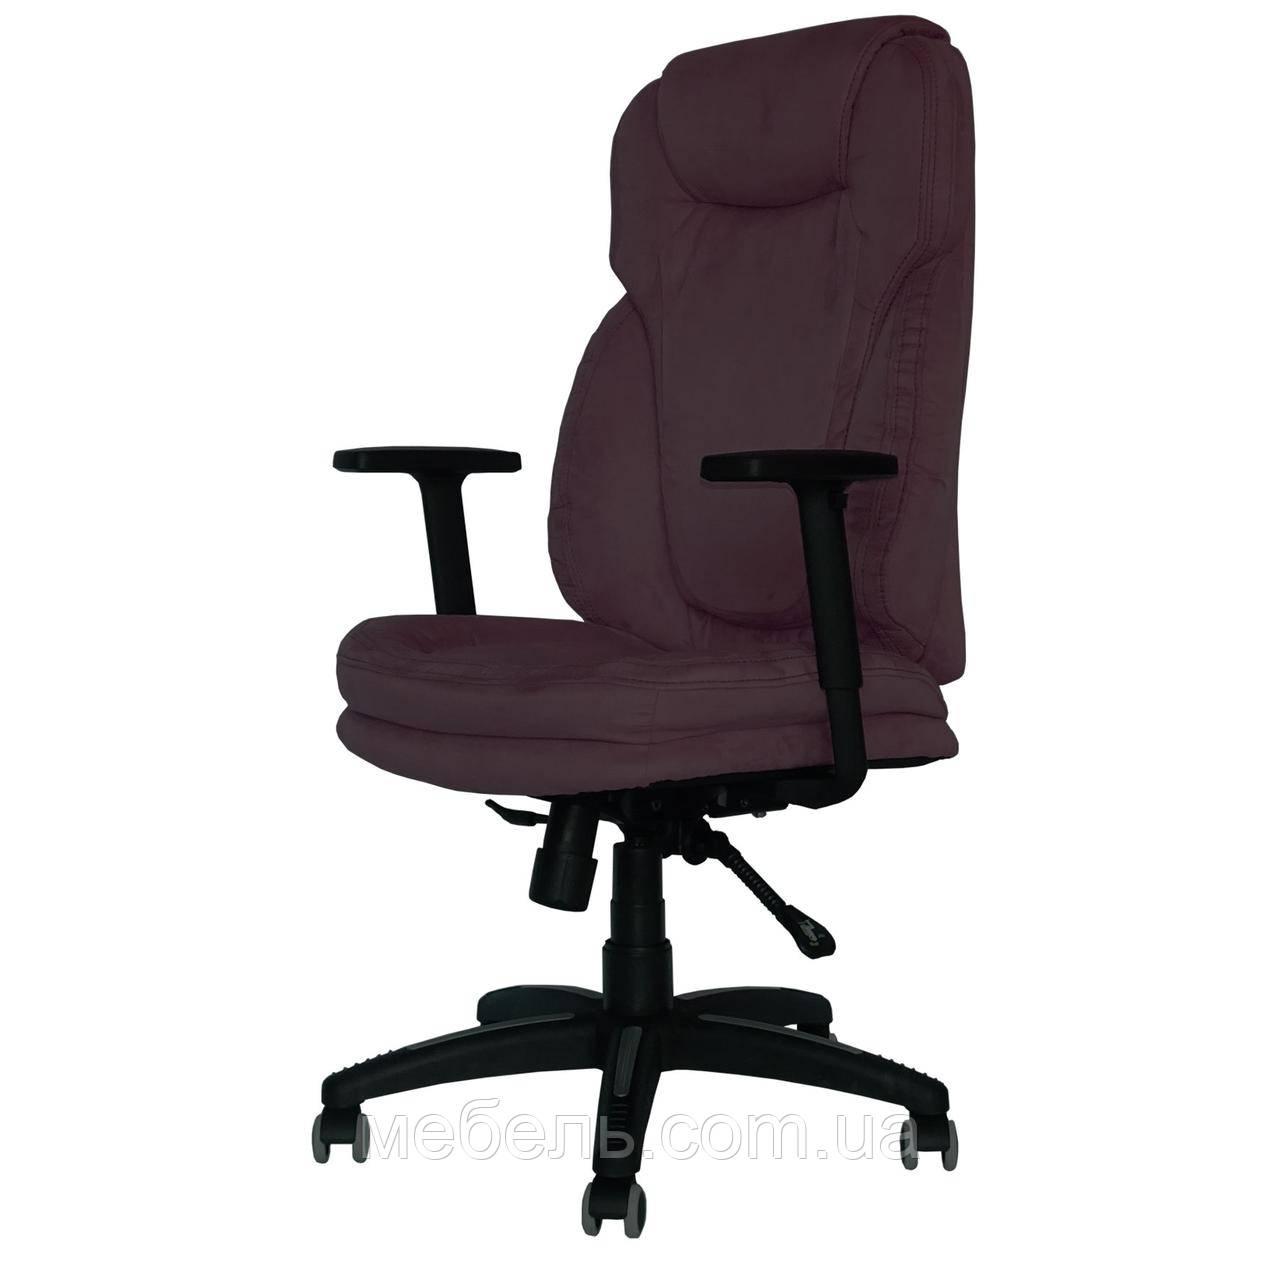 Офисное кресло Barsky Soft Blackbеrry SF-03